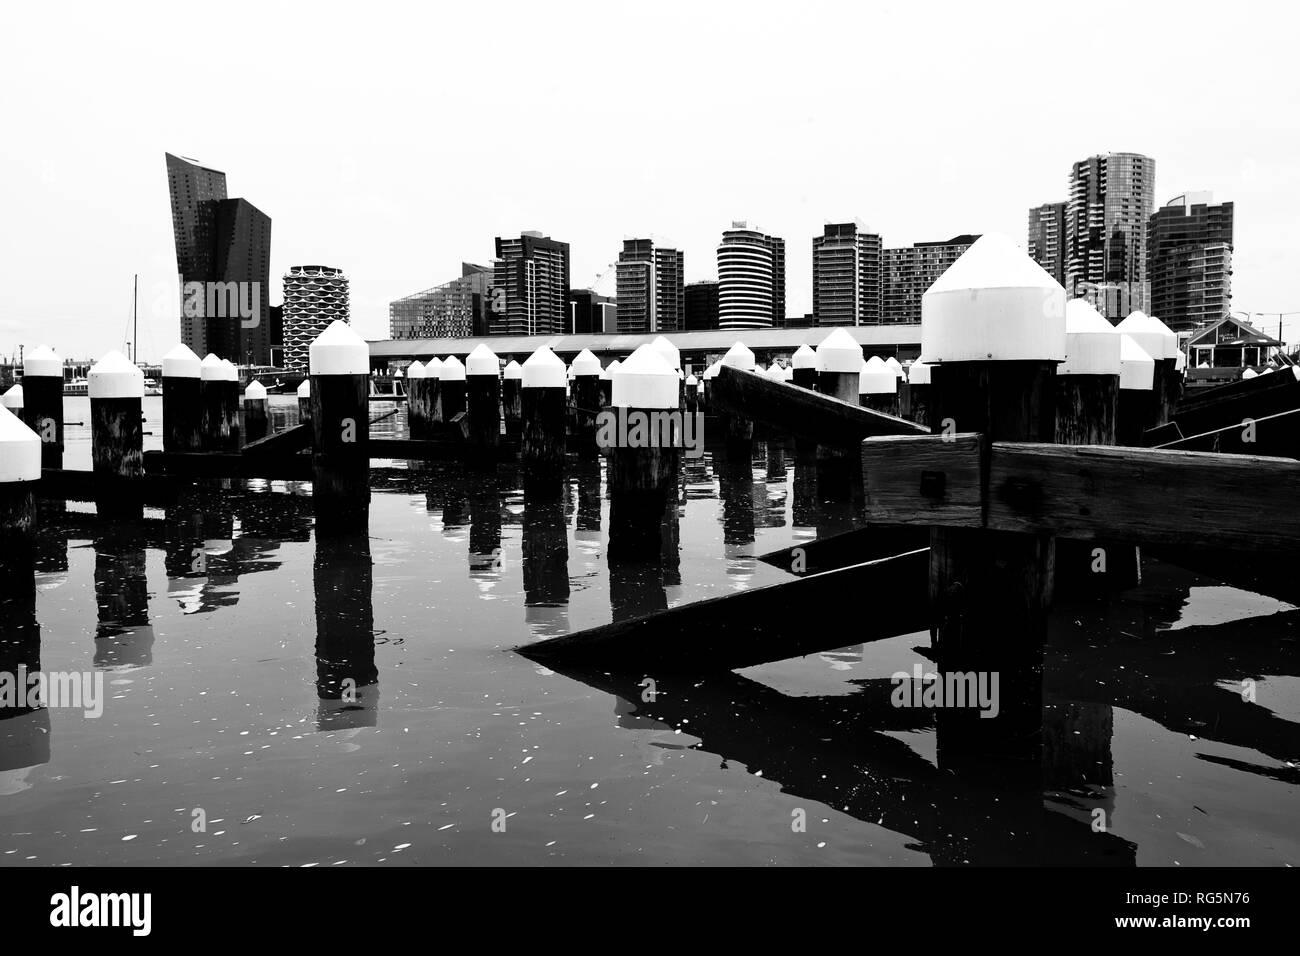 Australia, Victoria, VIC, Melbourne, Docklands, Victoria Harbour - Stock Image